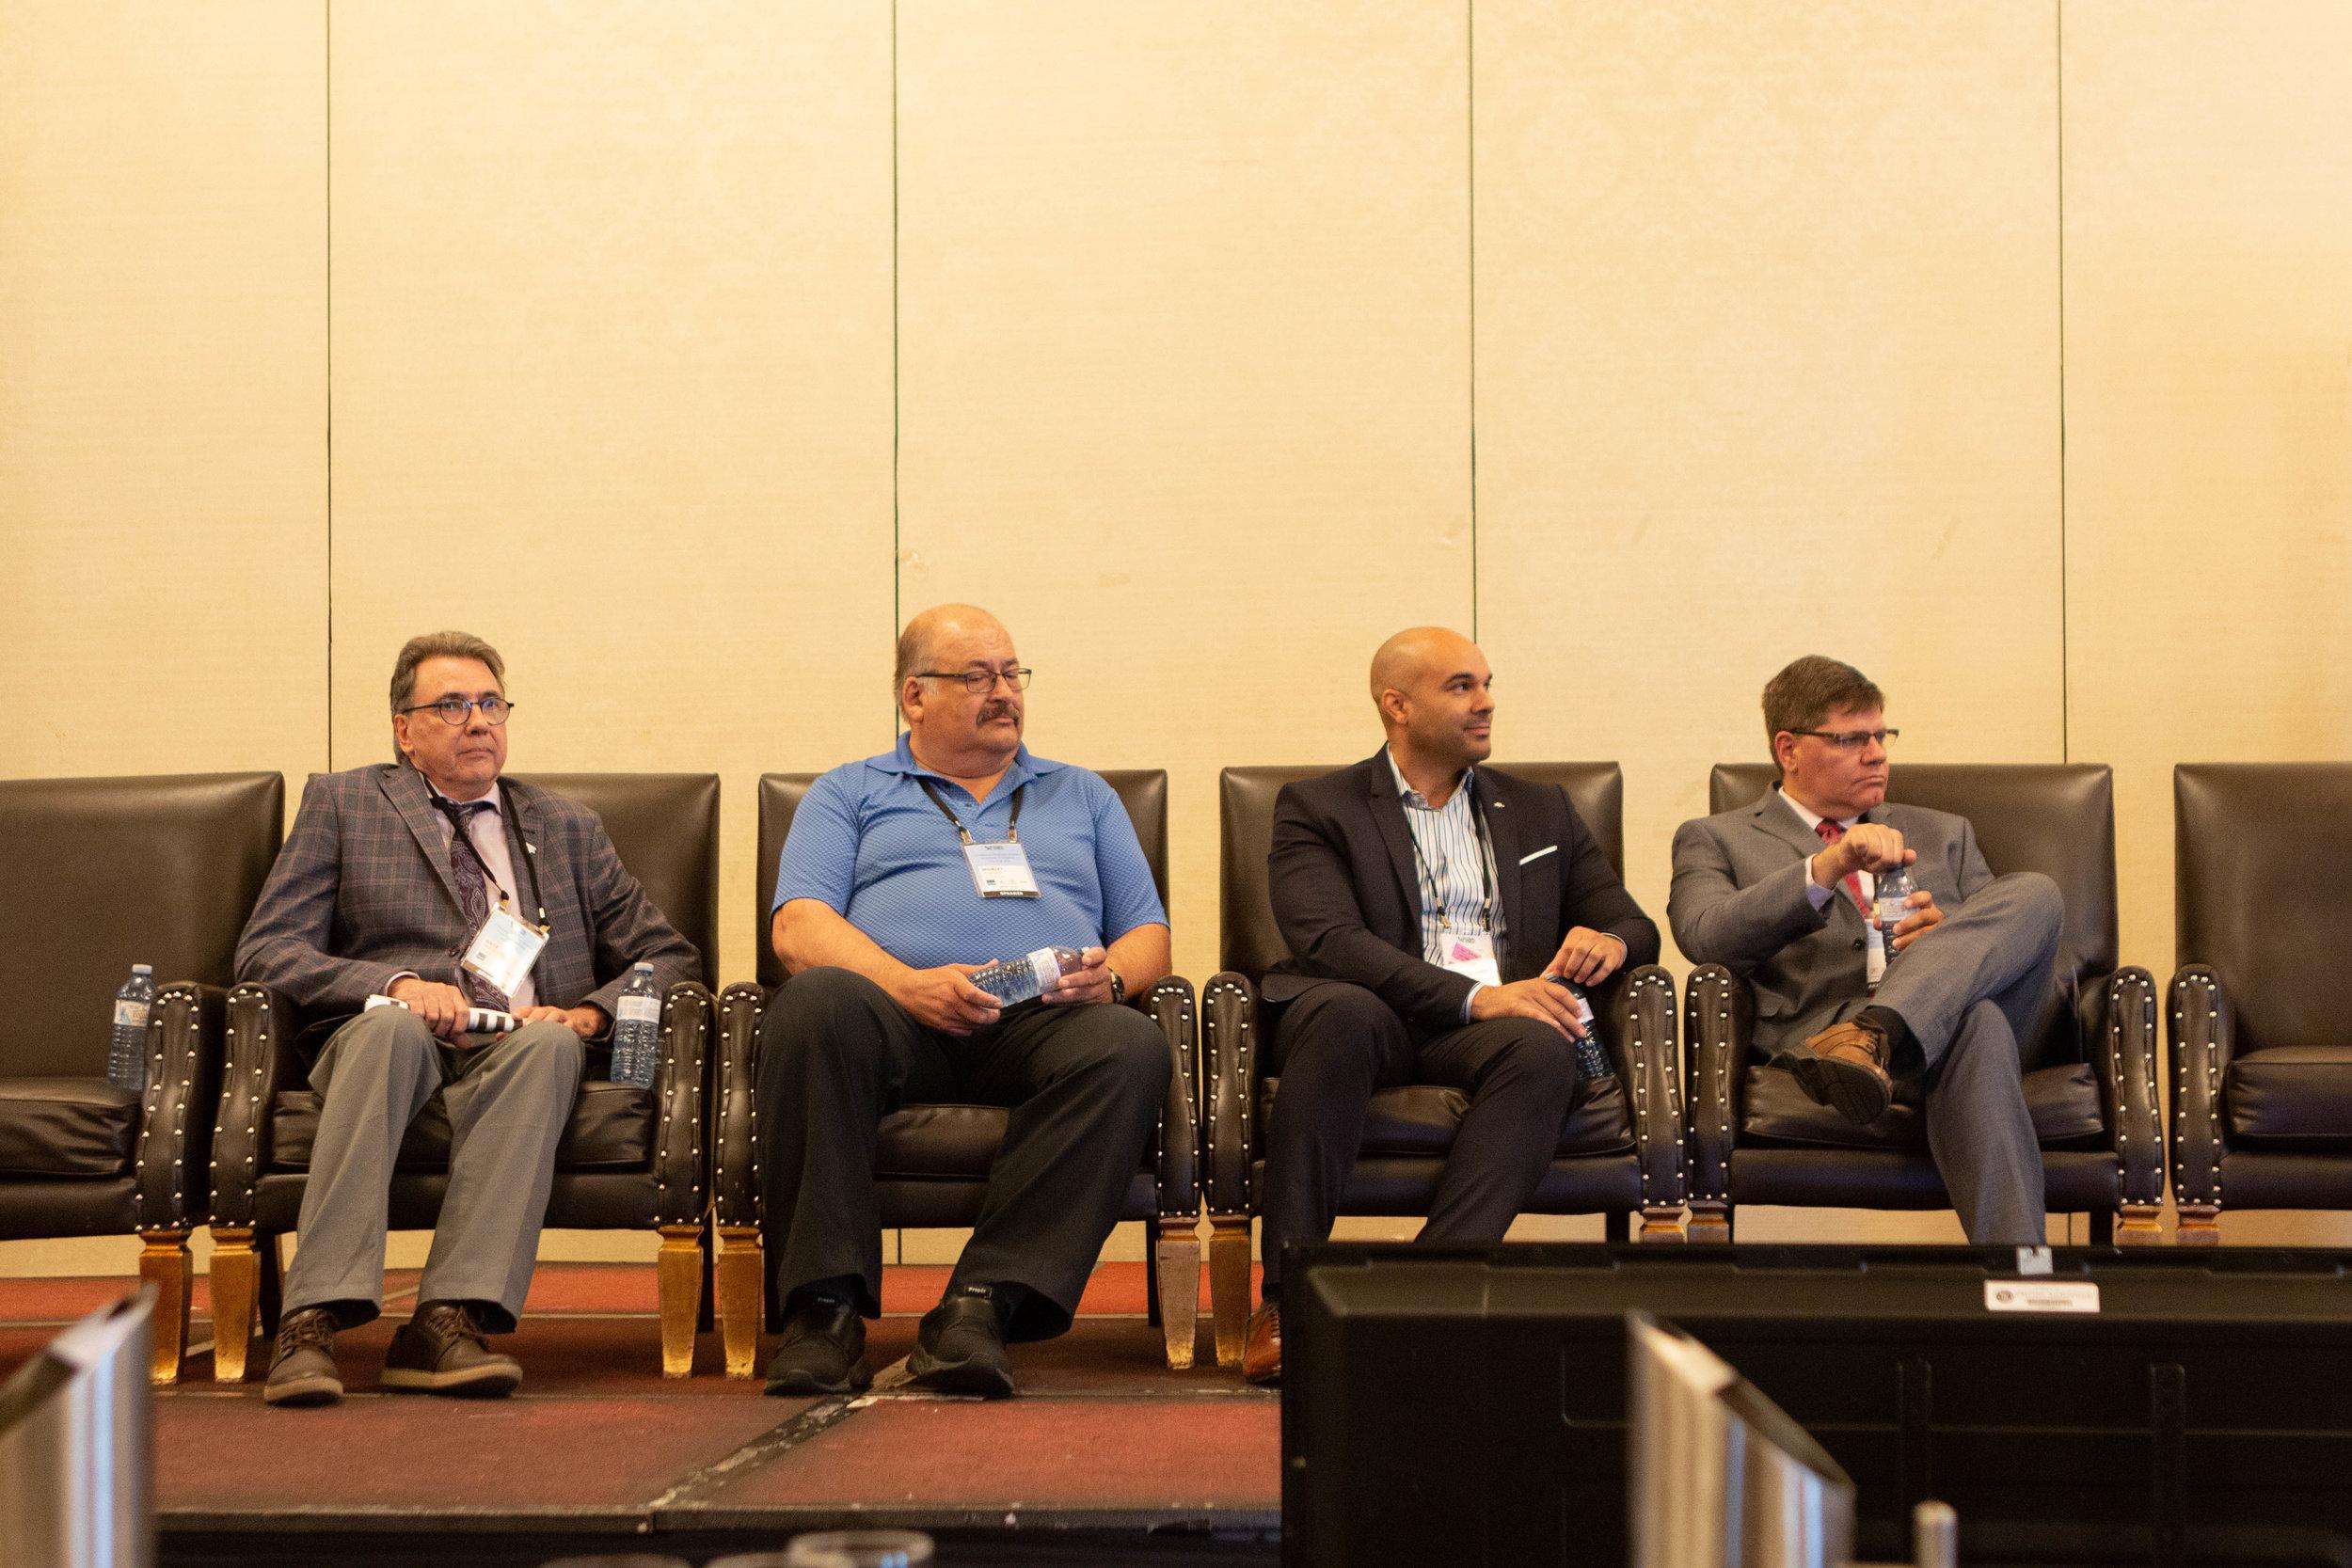 Panel: Dave Partington - Tok Group ; Morley Fortier - City of Winnipeg Transit System ; Bem Case - TTC ; Kirt Conrad - SARTA